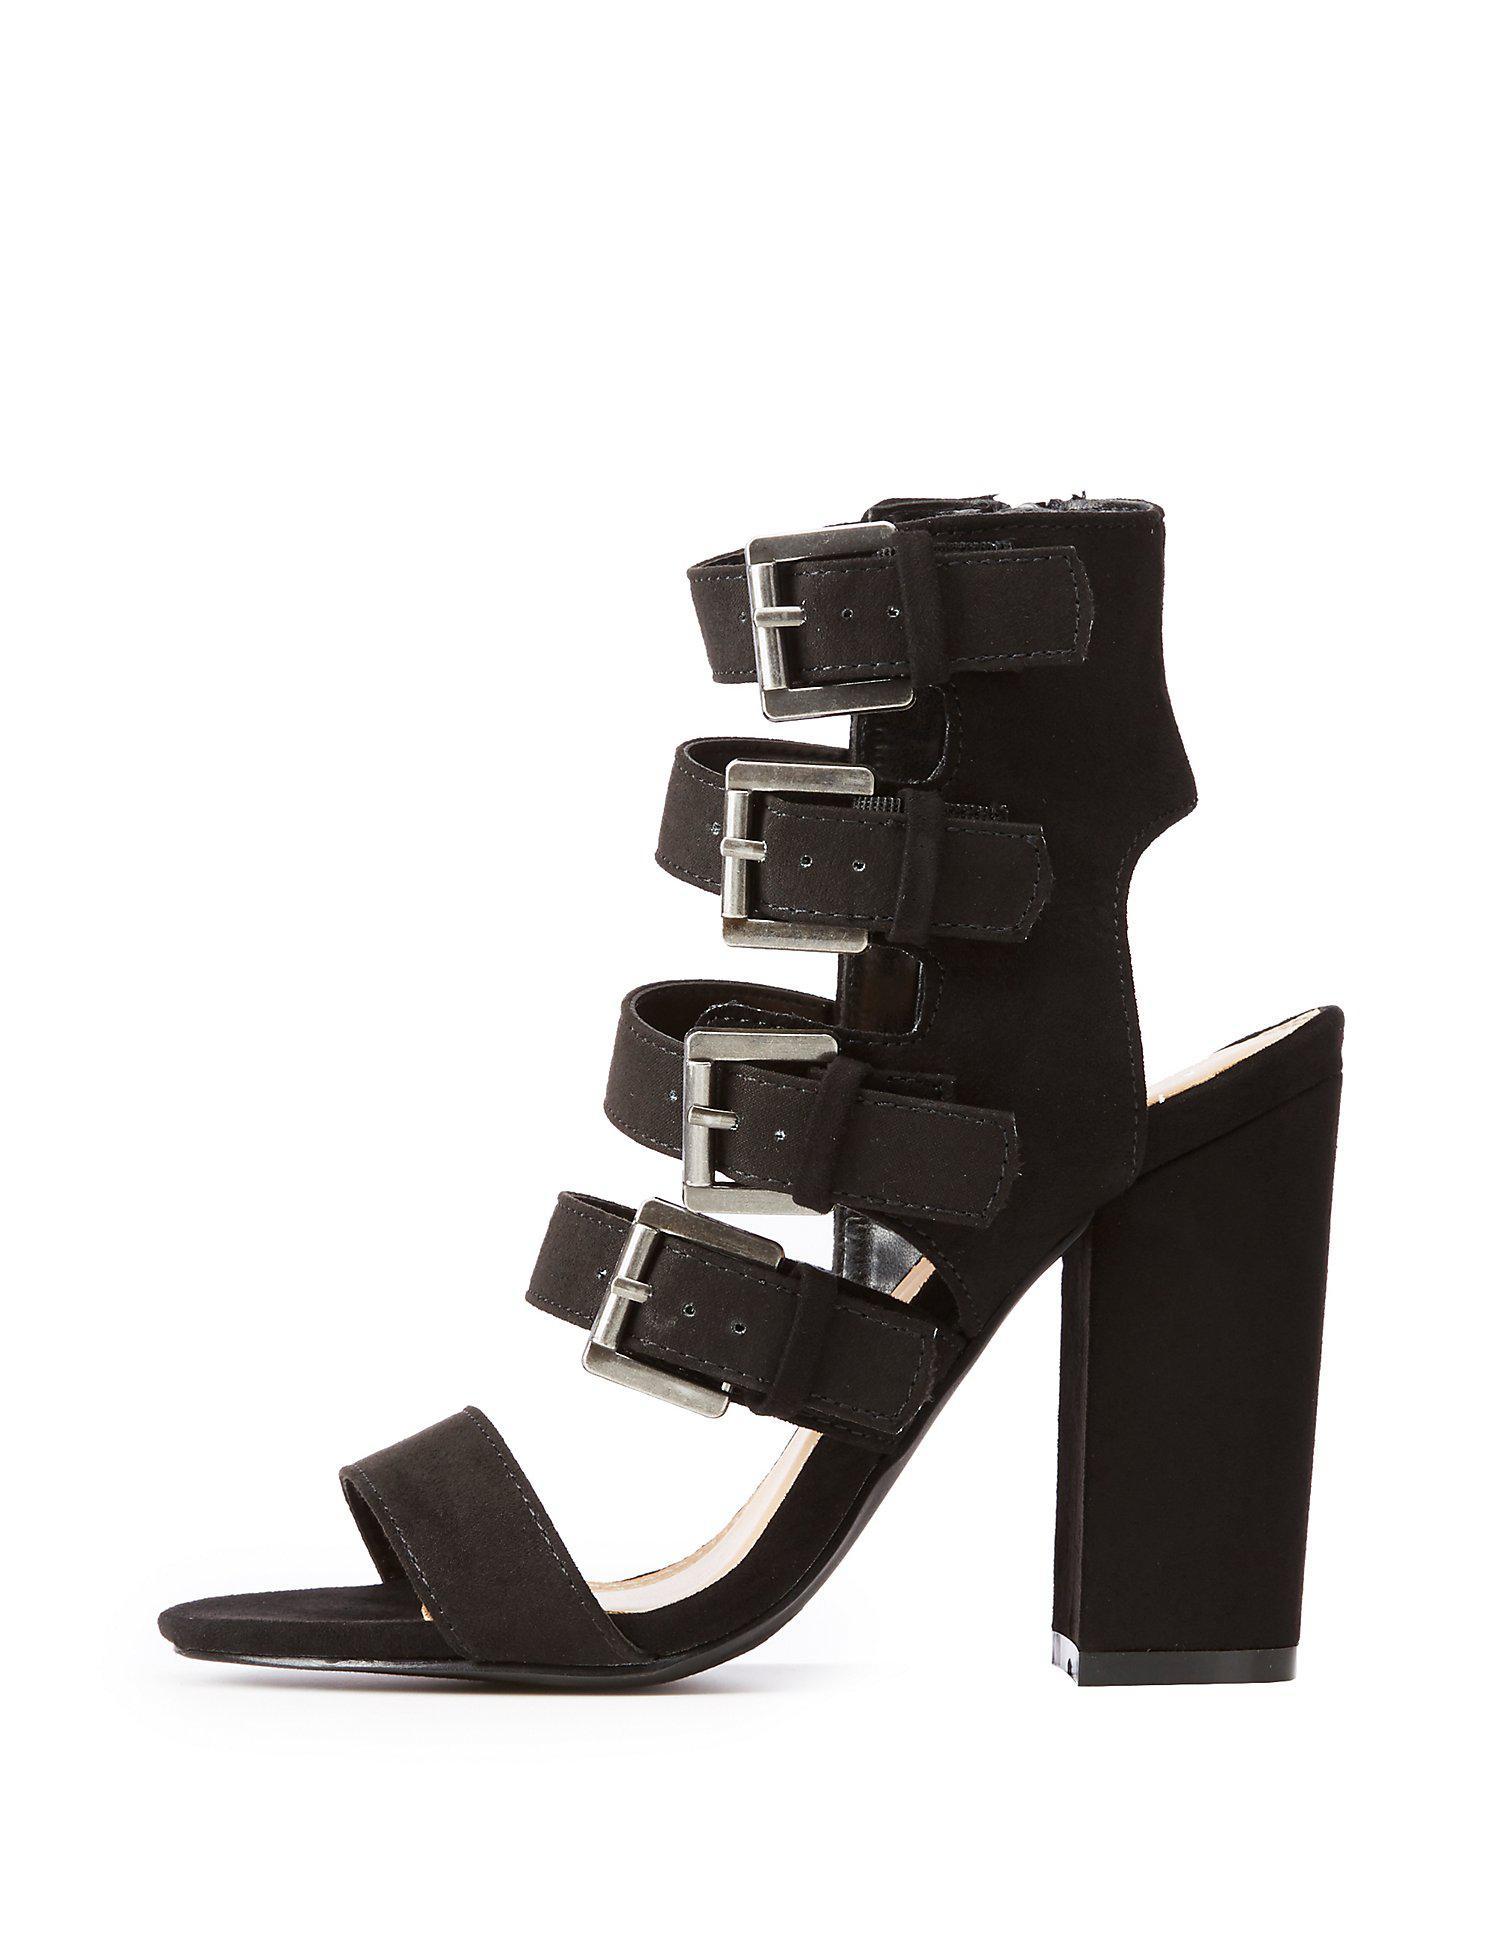 2d80f341fdb Lyst - Charlotte Russe Buckle Strap Block Heel Sandals in Black